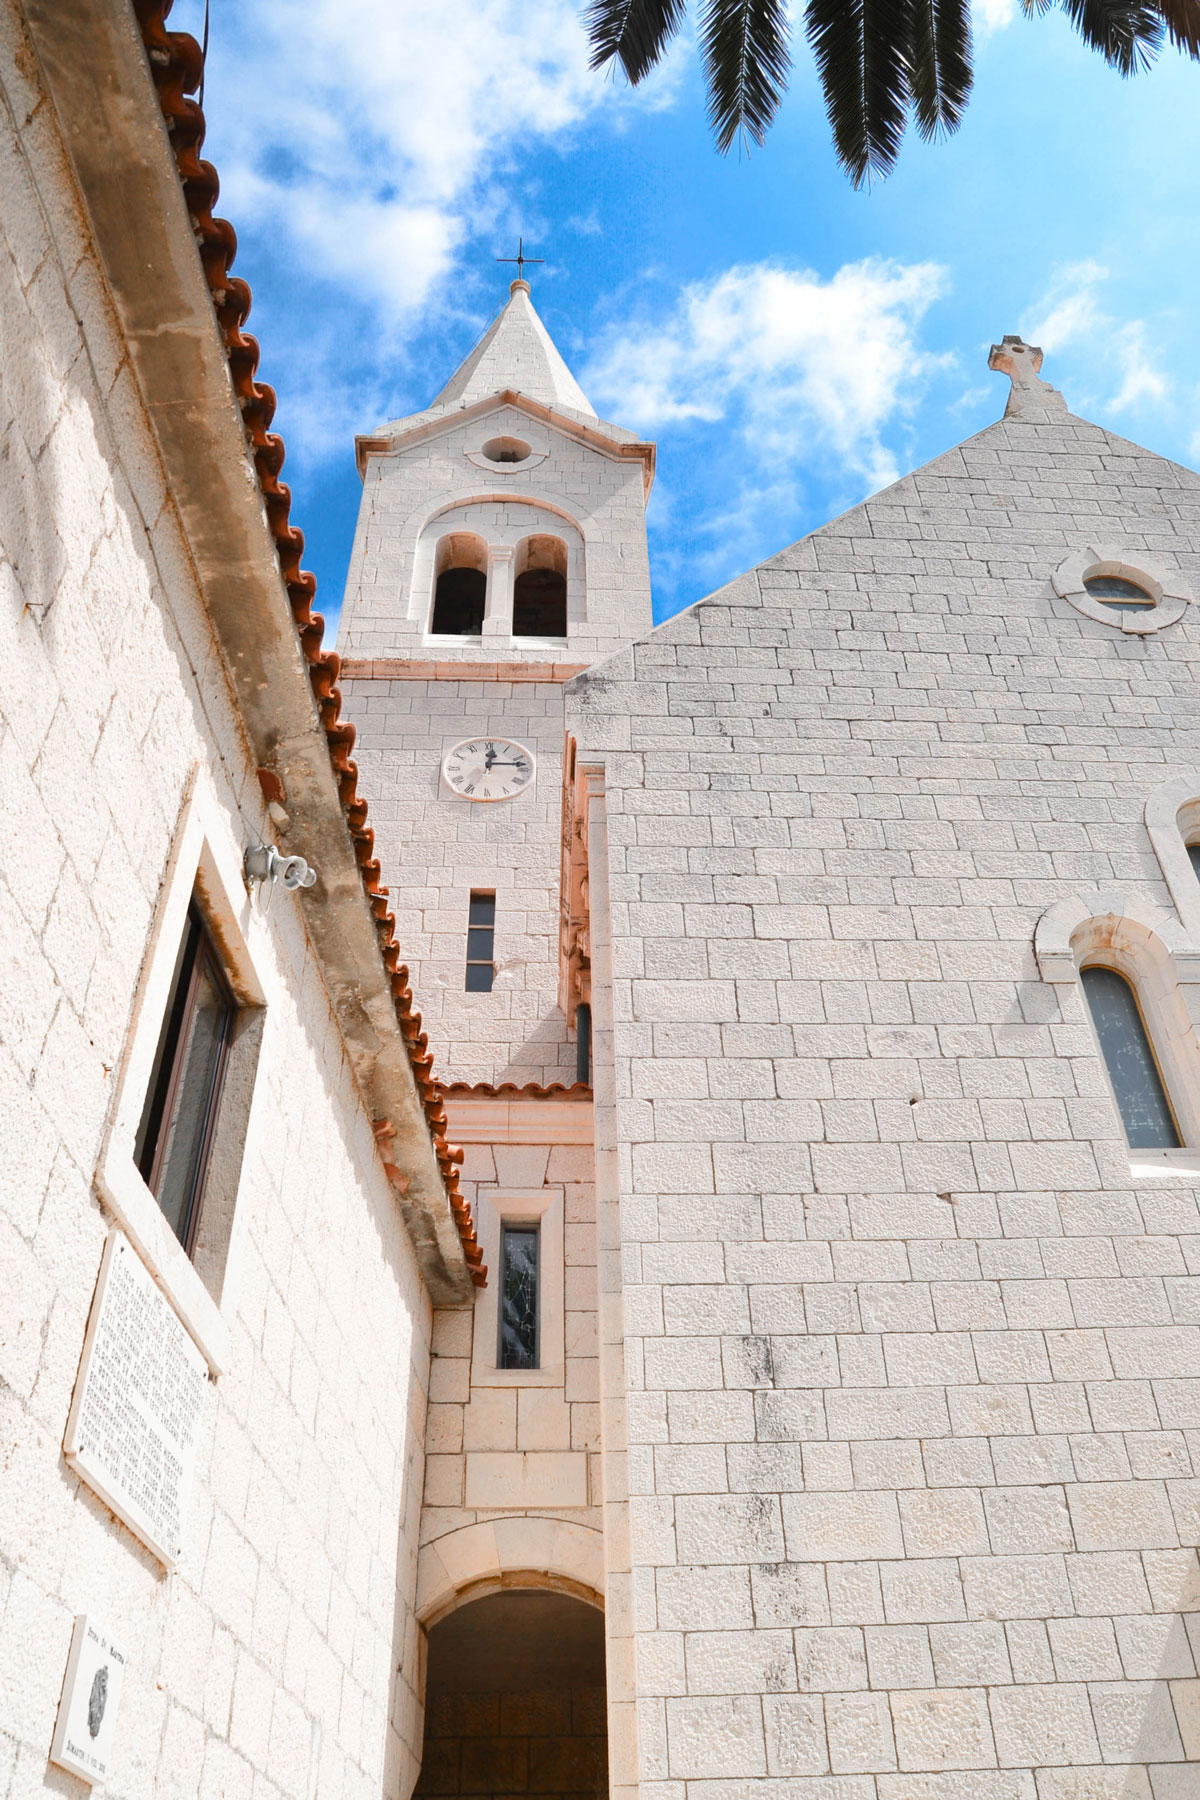 Sumartin-Brac-Island-Croatia-church